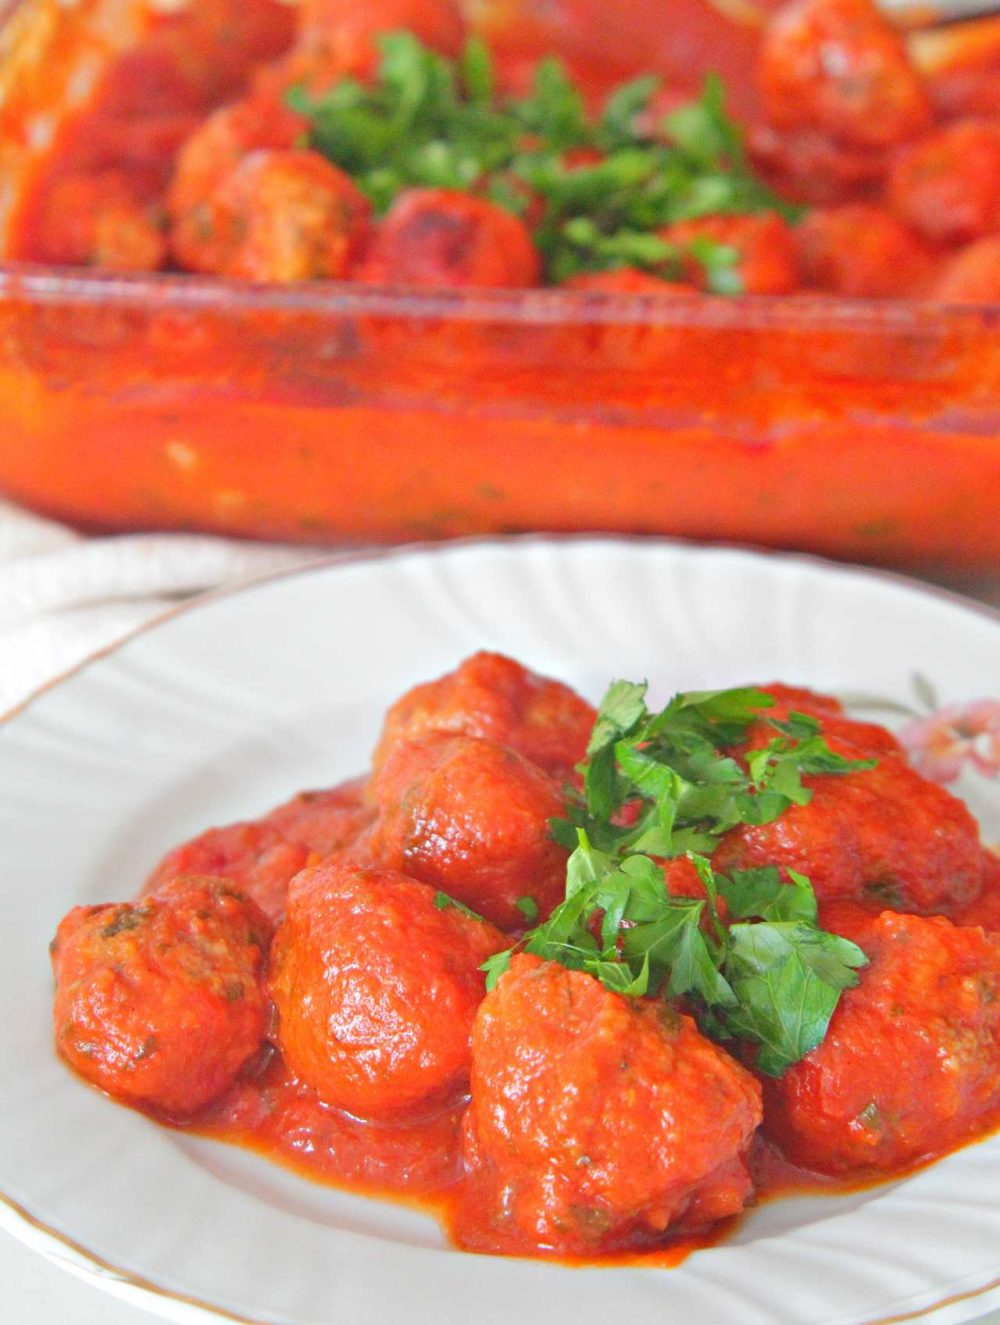 Tomato meatballs